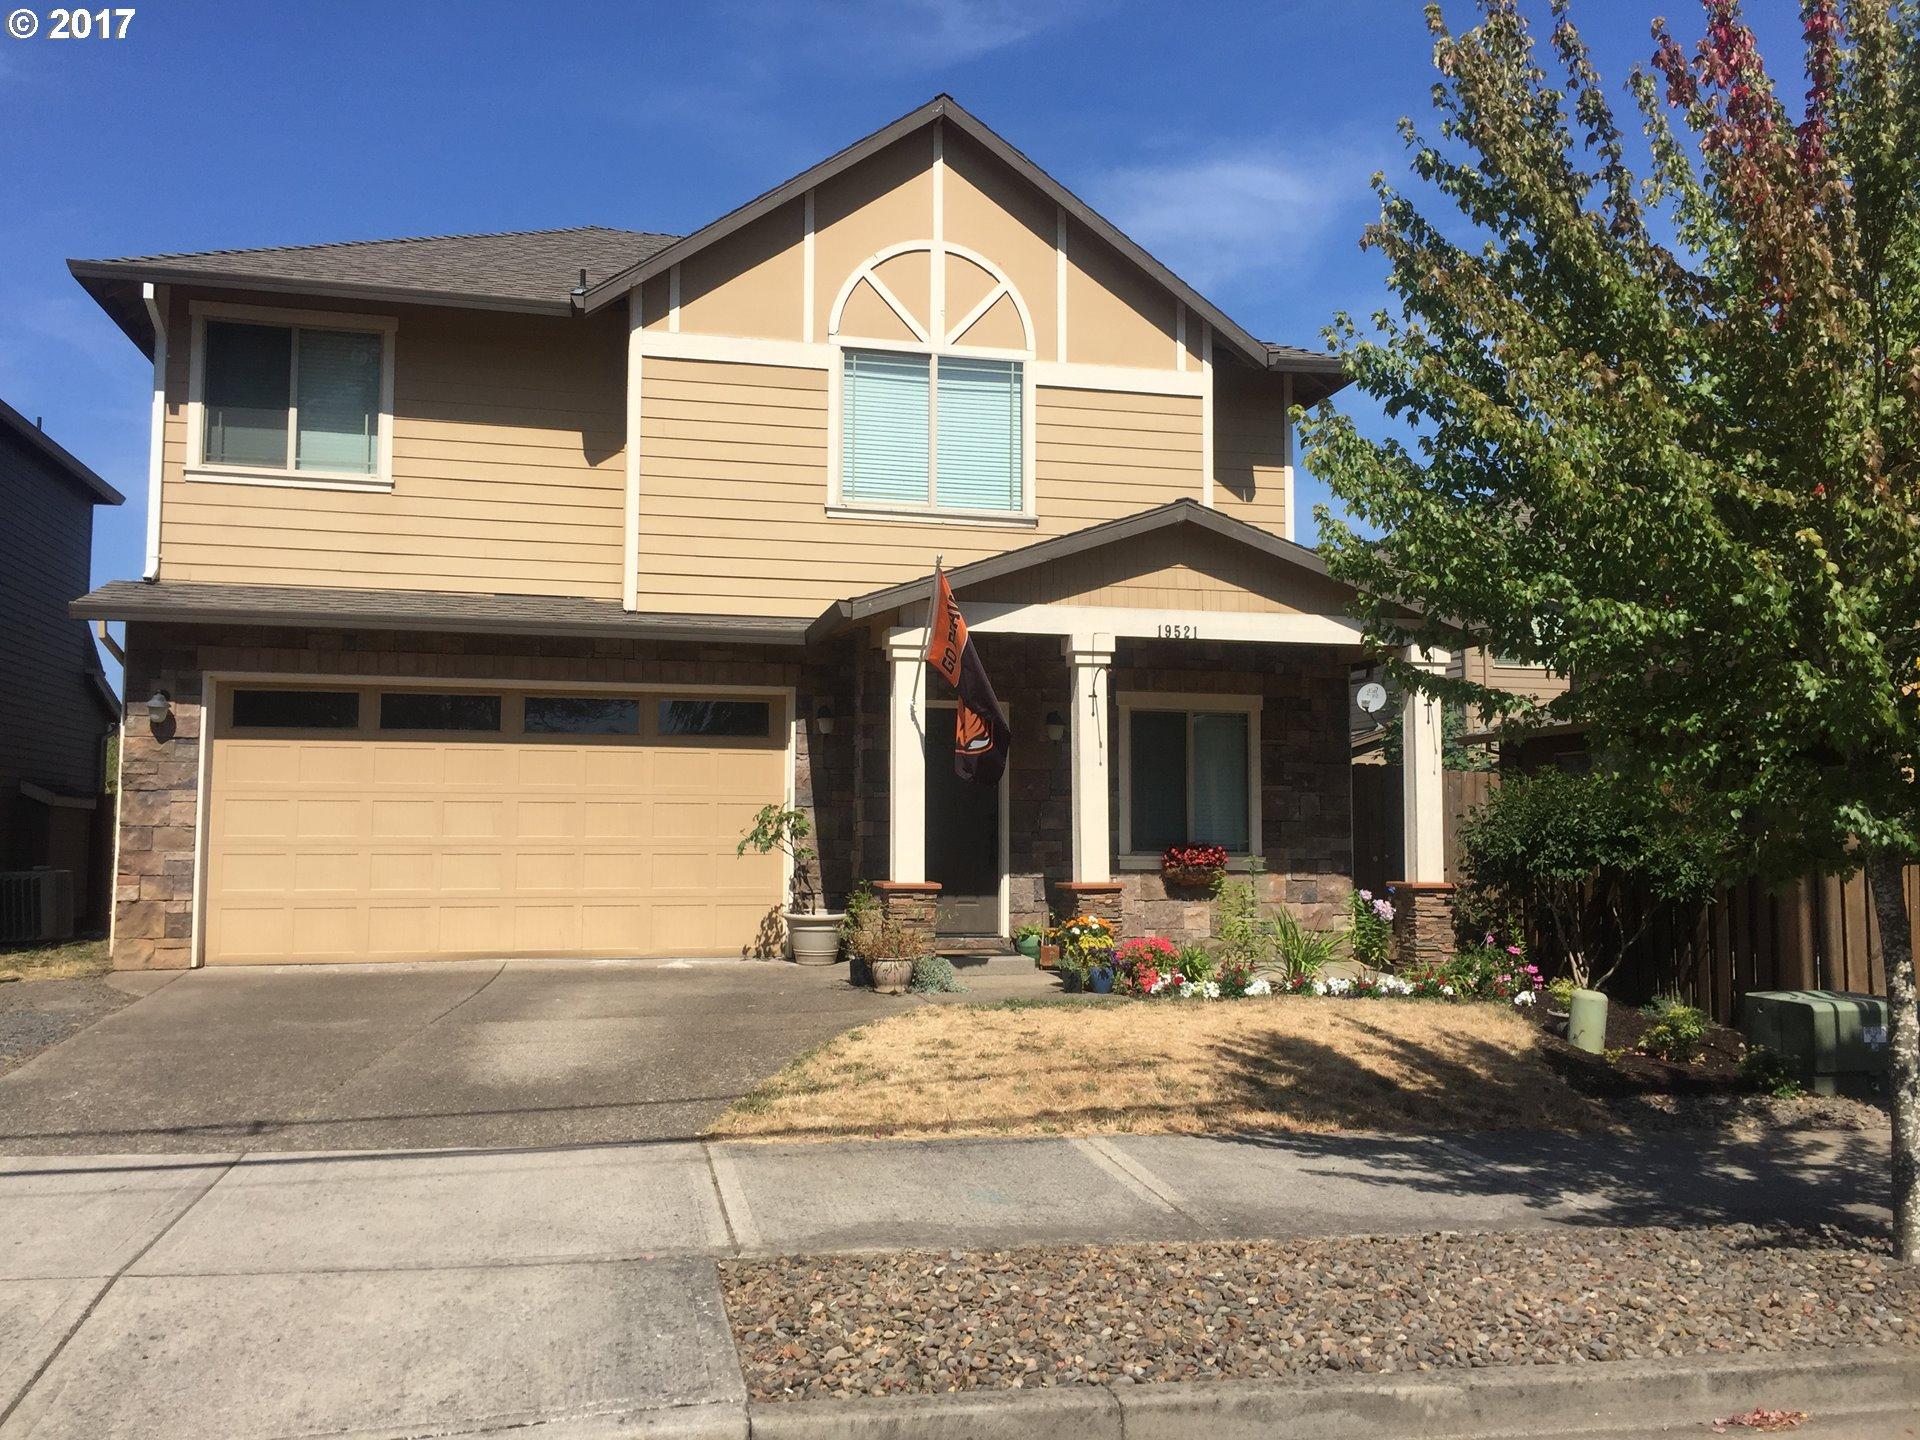 19521 LELAND RD, Oregon City, OR 97045